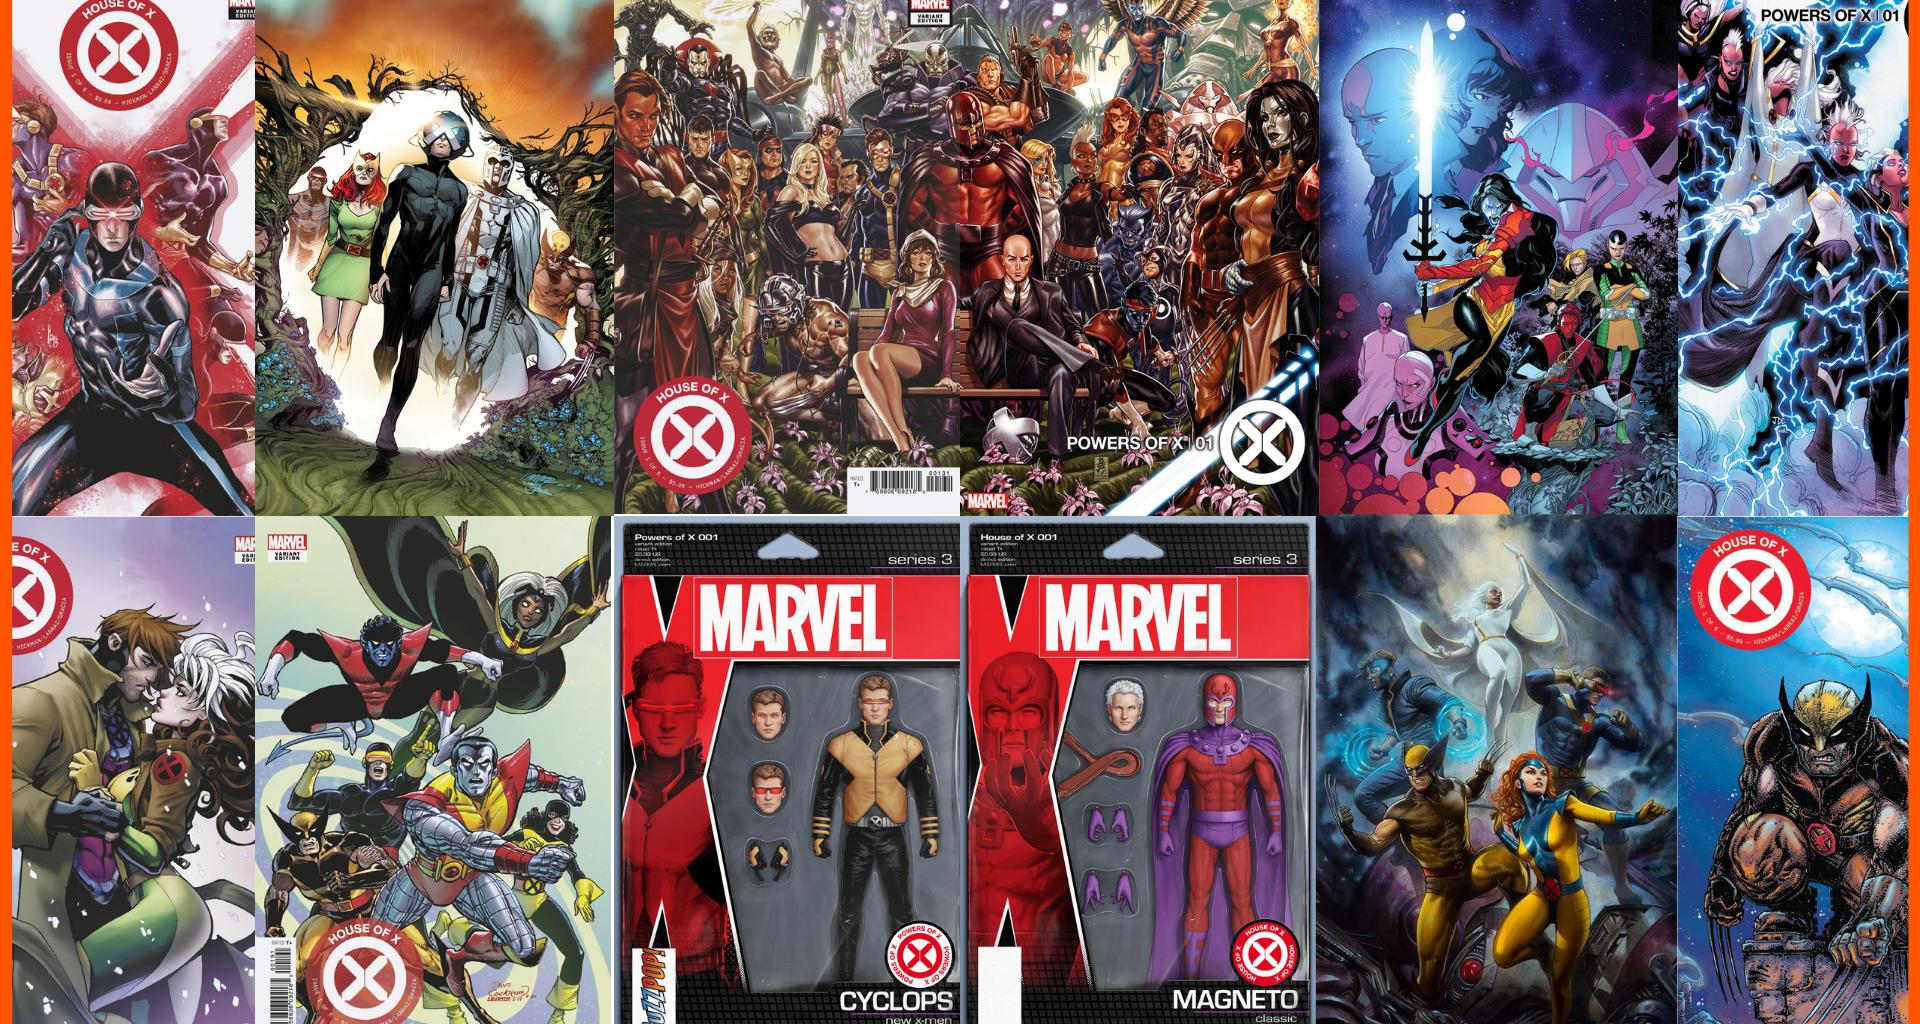 5 Era Penting Dalam Sejarah Komik X-MEN!